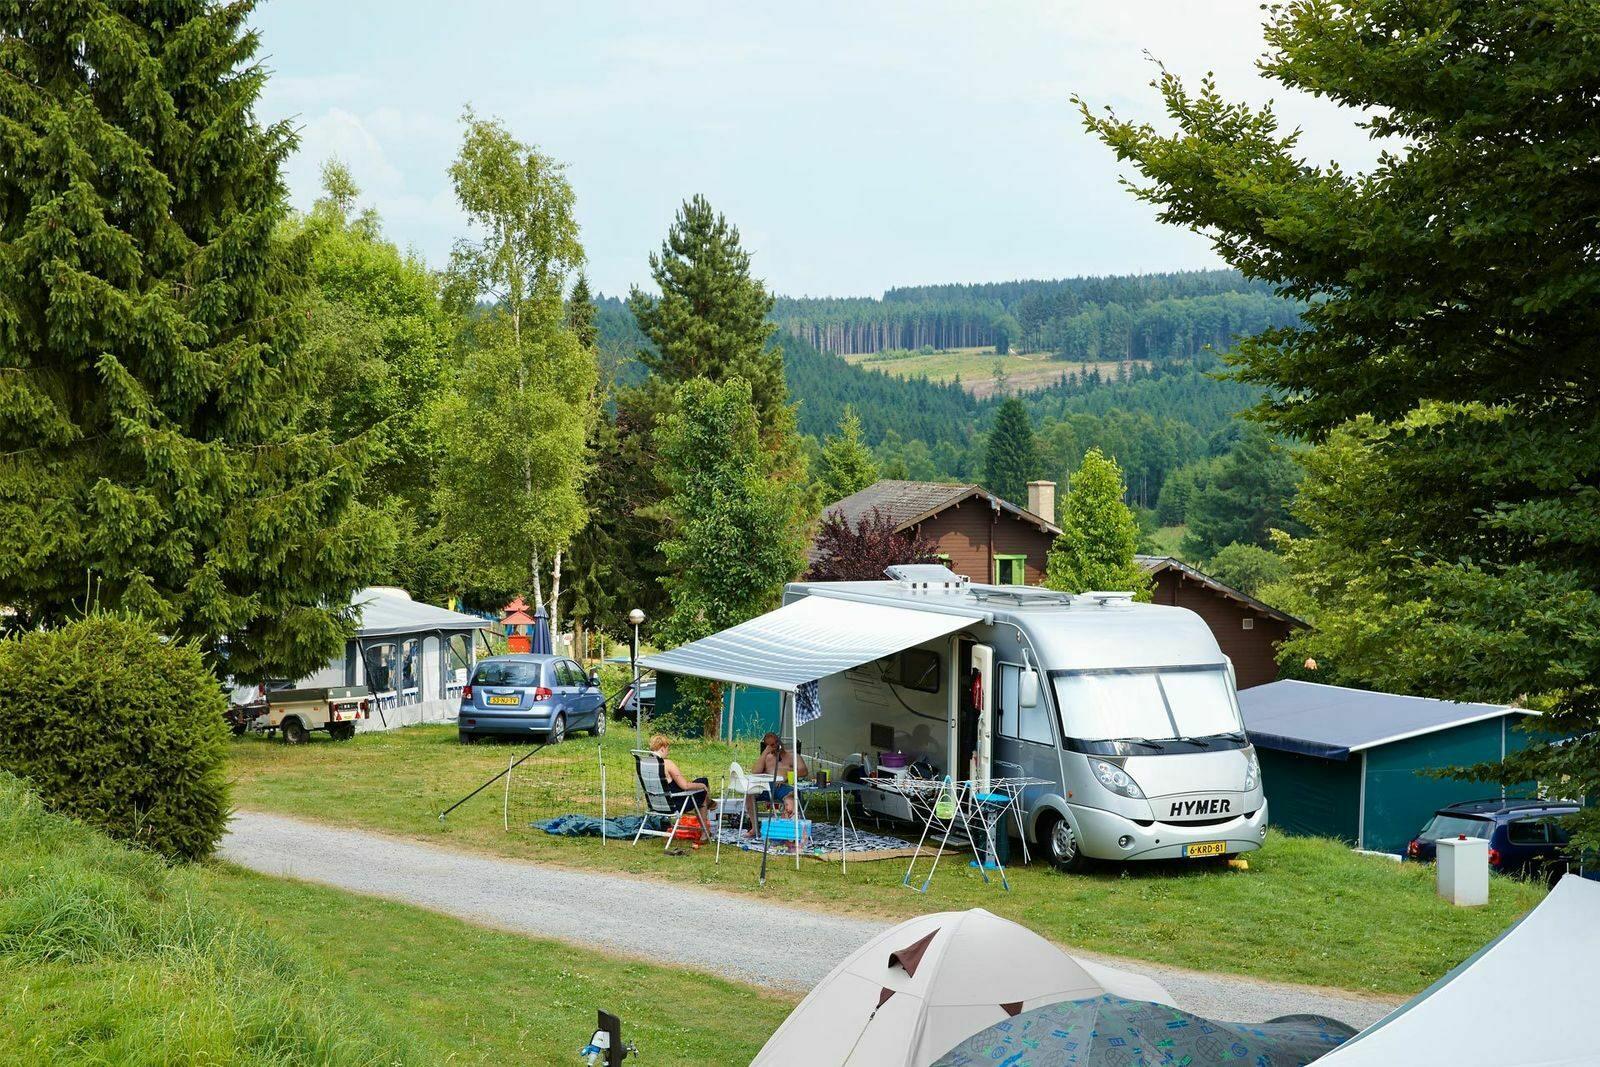 Camping Dochamps